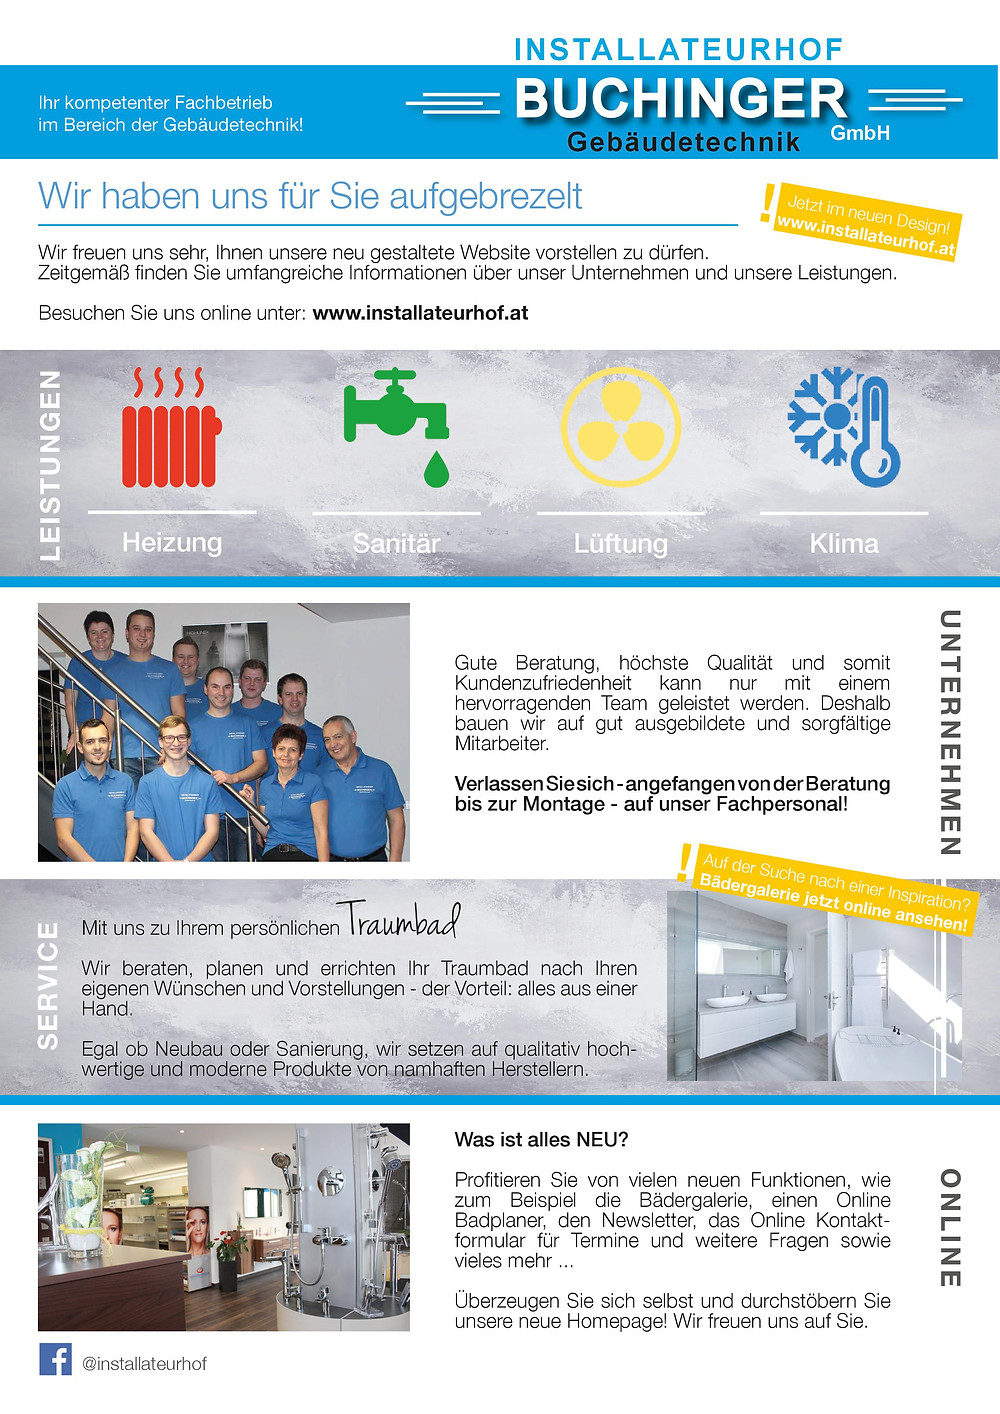 Marktplatzl Ausgabe April 2019 Installateurhof Buchinger Gebäudetechnik